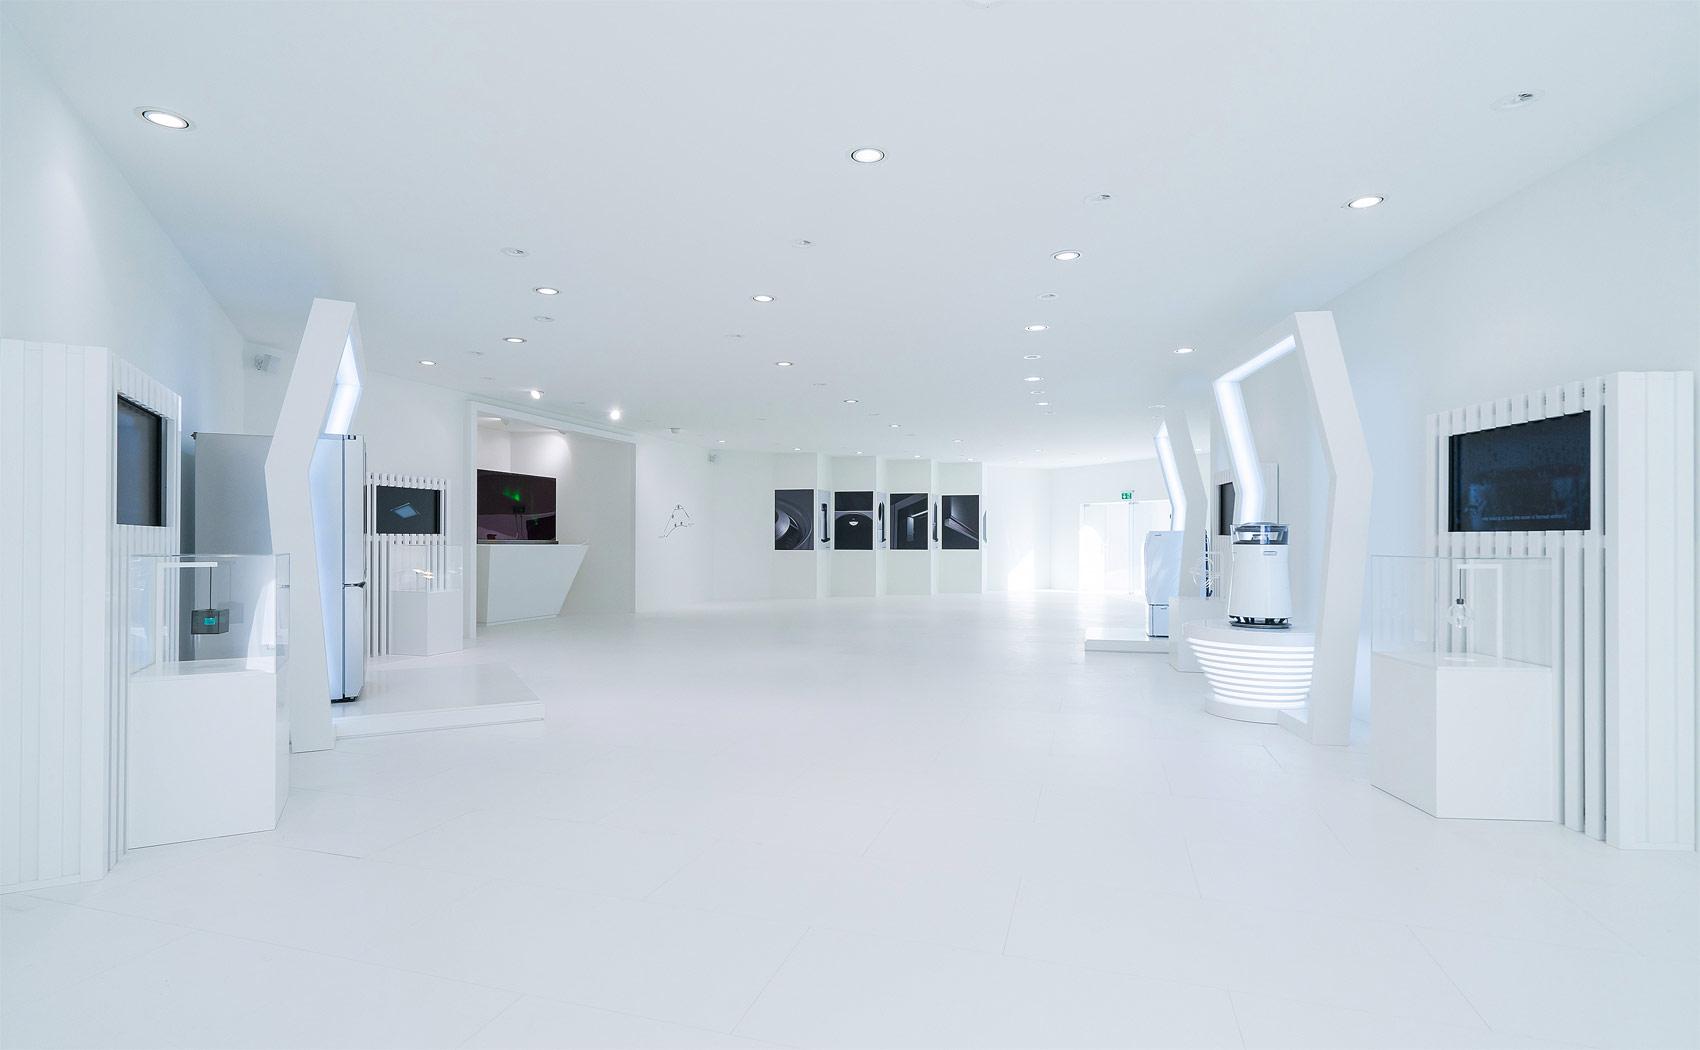 LG Launches New Ultra-Luxury 'LG SIGNATURE' Range In Berlin 10